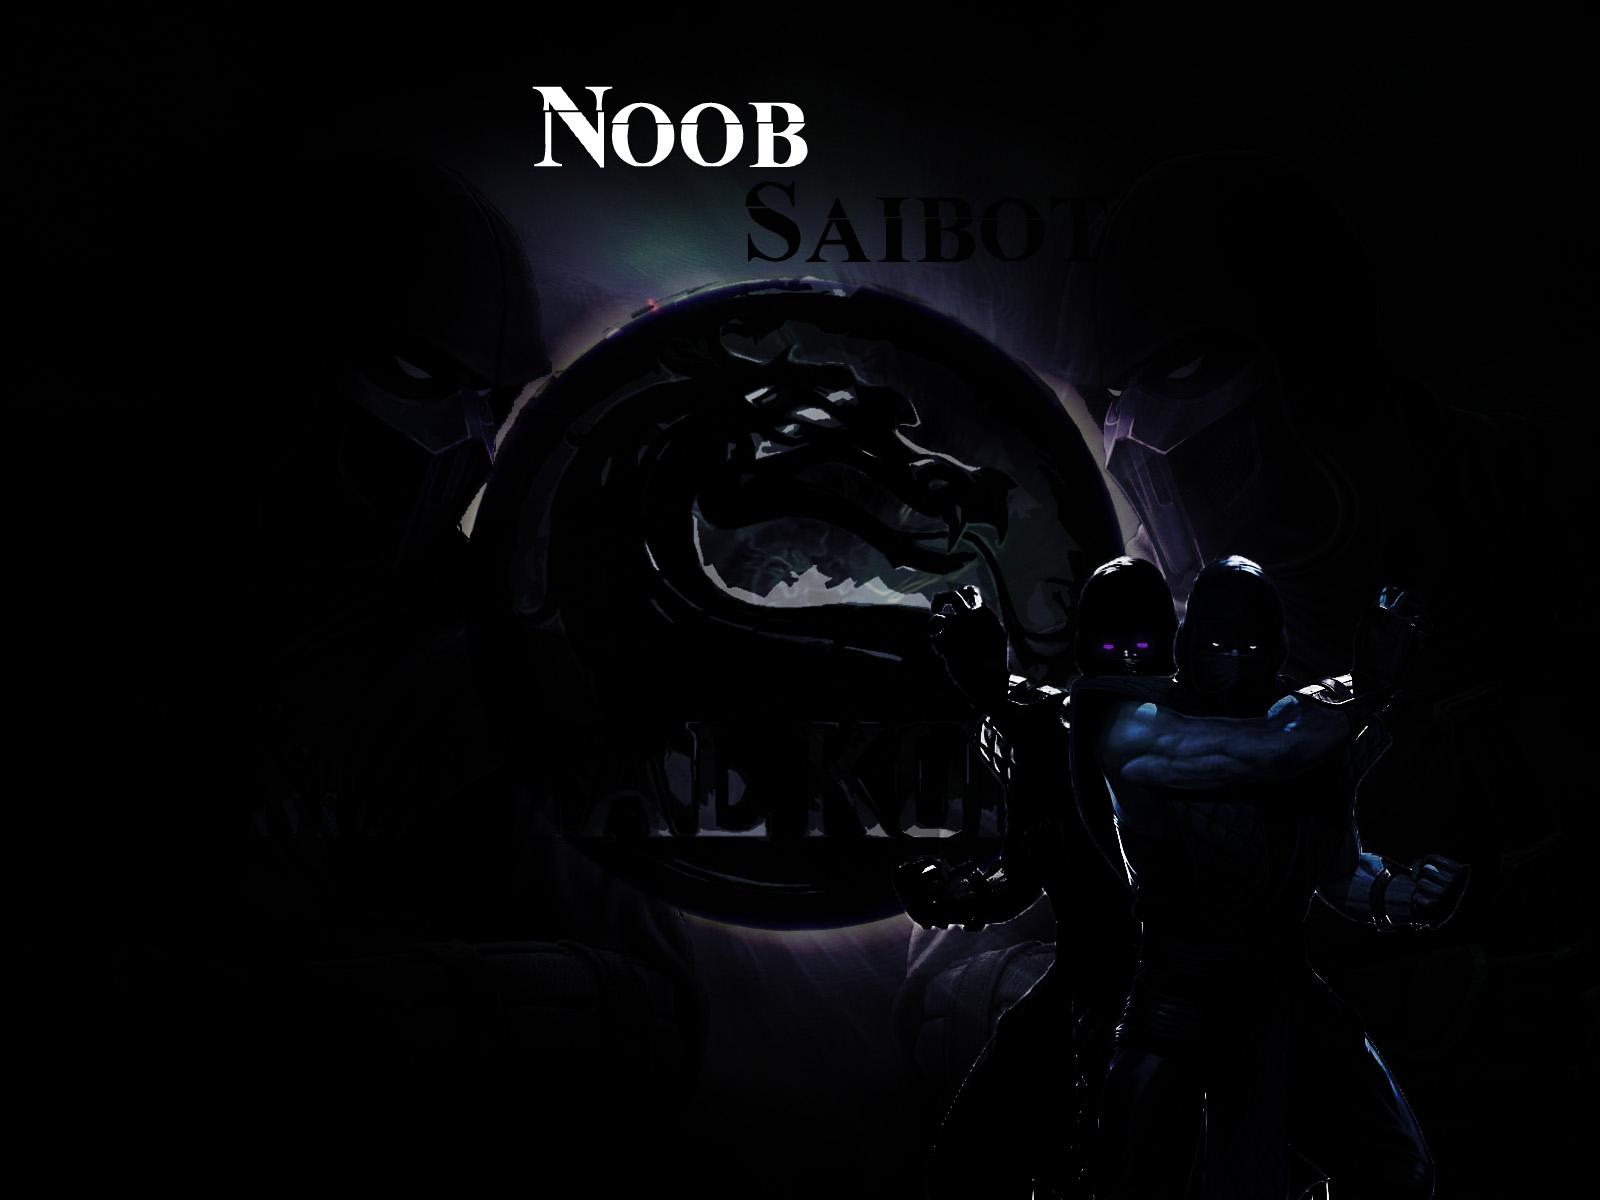 noob-saibot-MK-Noob-Saibot-by-Reaper-The-Creeper-on-deviantART-wallpaper-wp428000